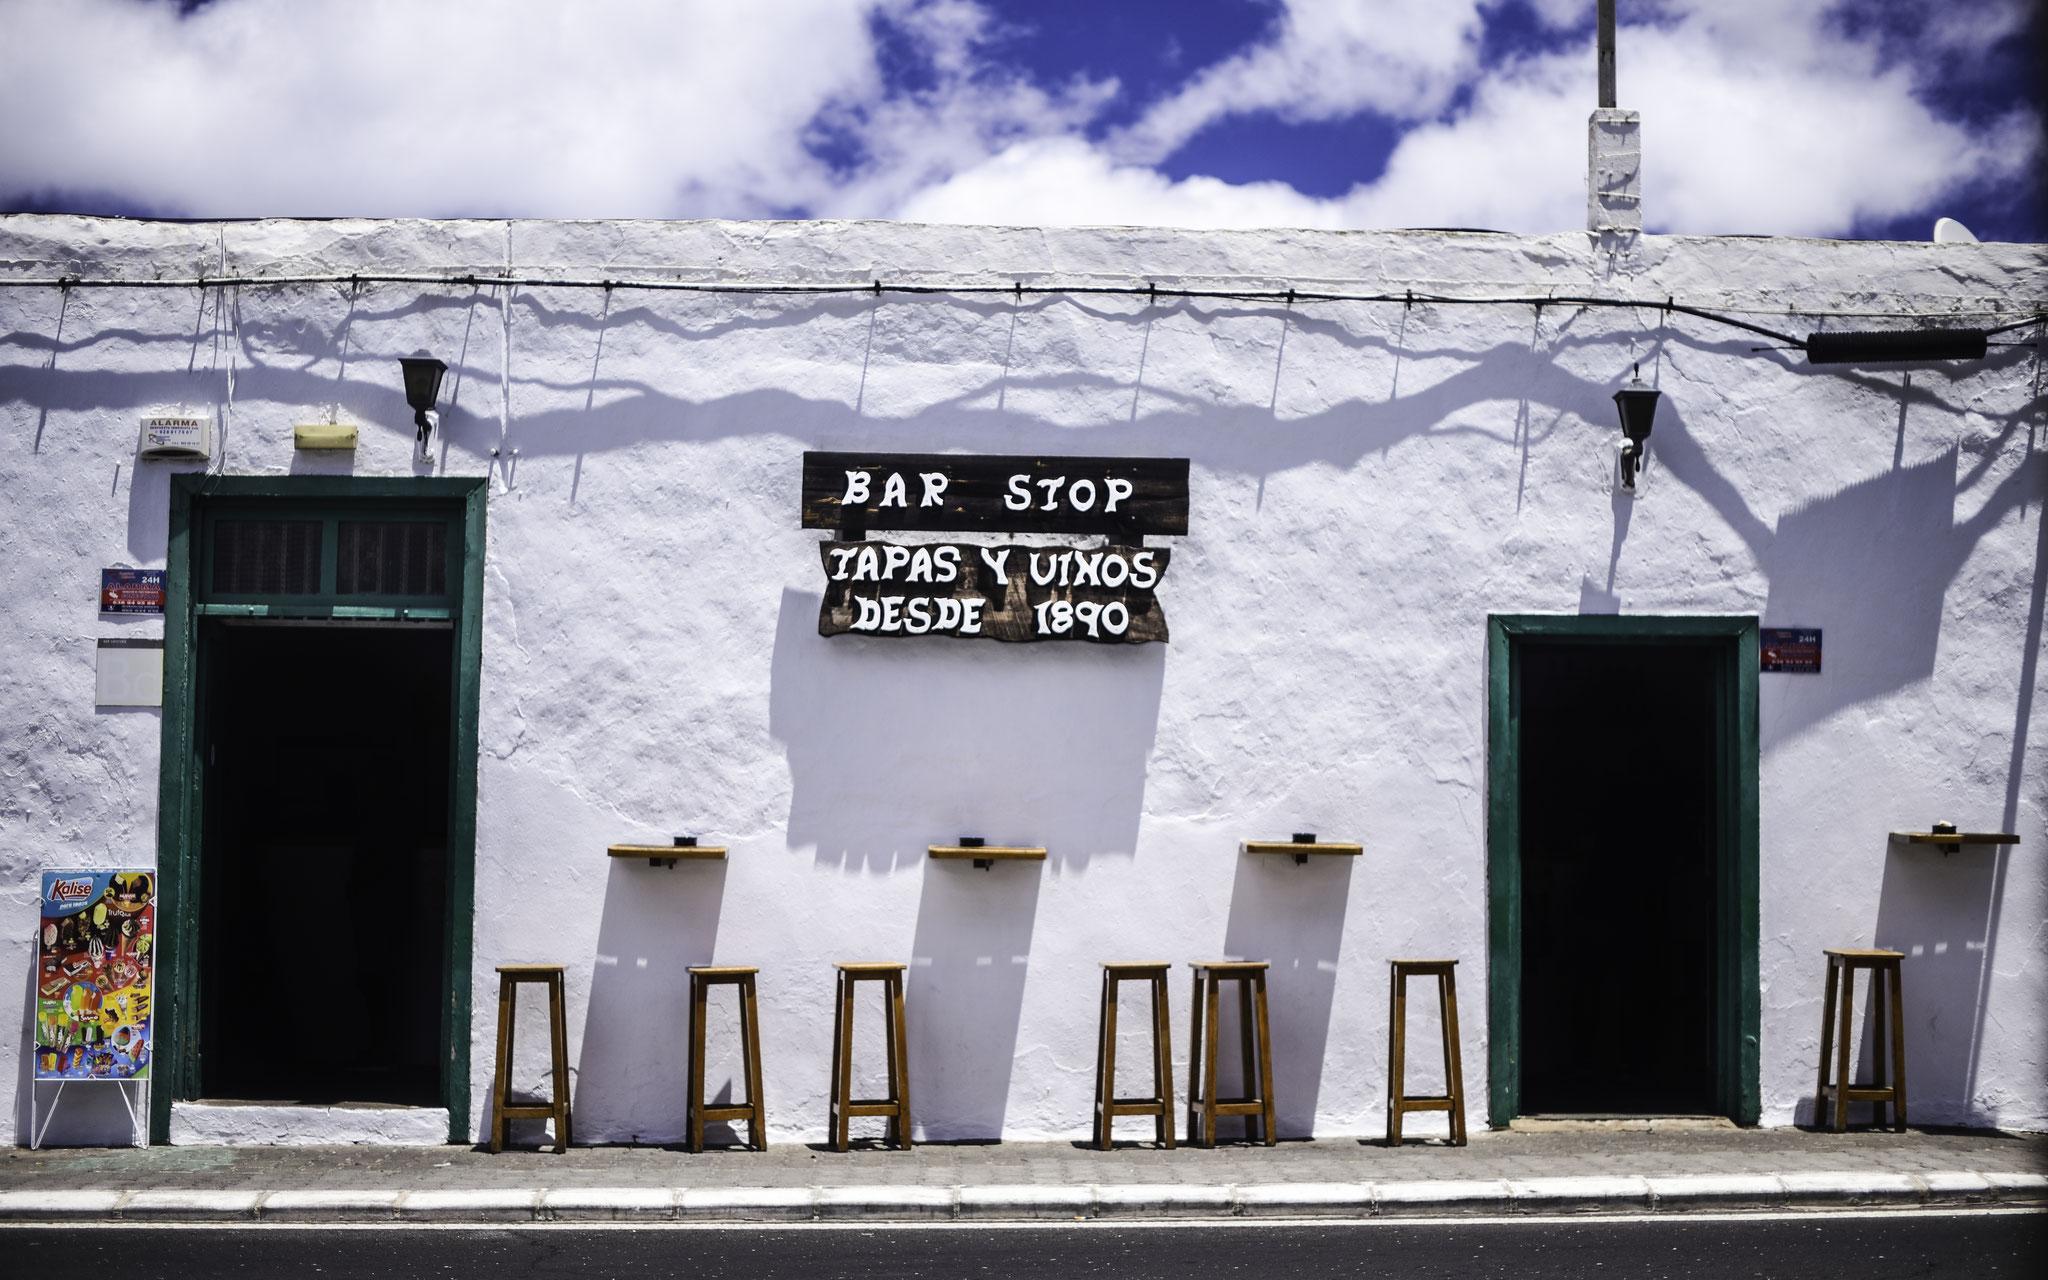 Yaiza, Lanzarote